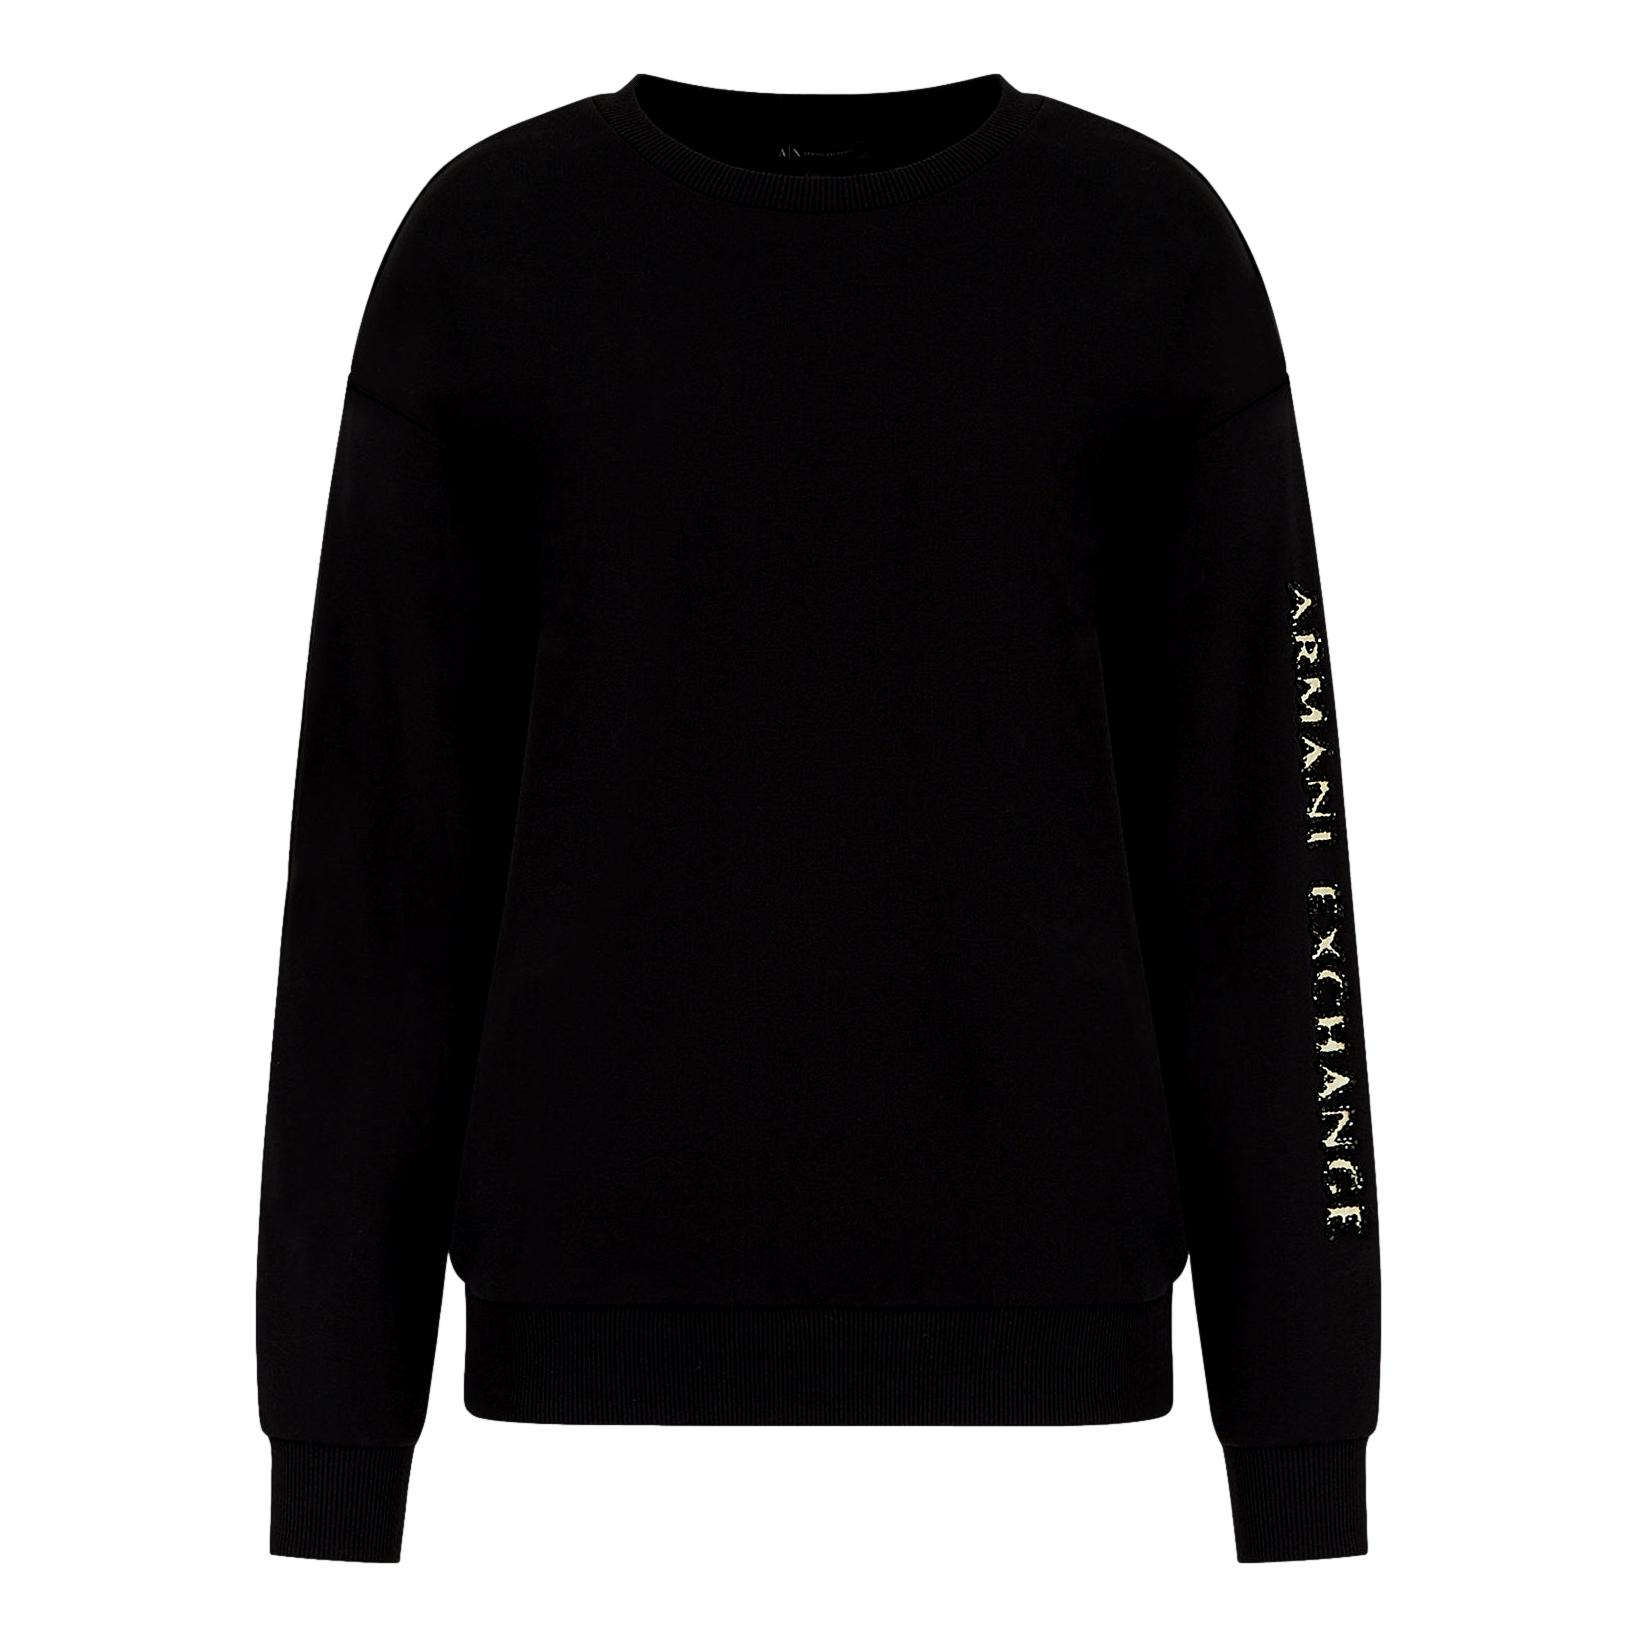 Sweatshirt with logo on the arm ARMANI EXCHANGE |  | 6KYM48 YJ6PZ1200